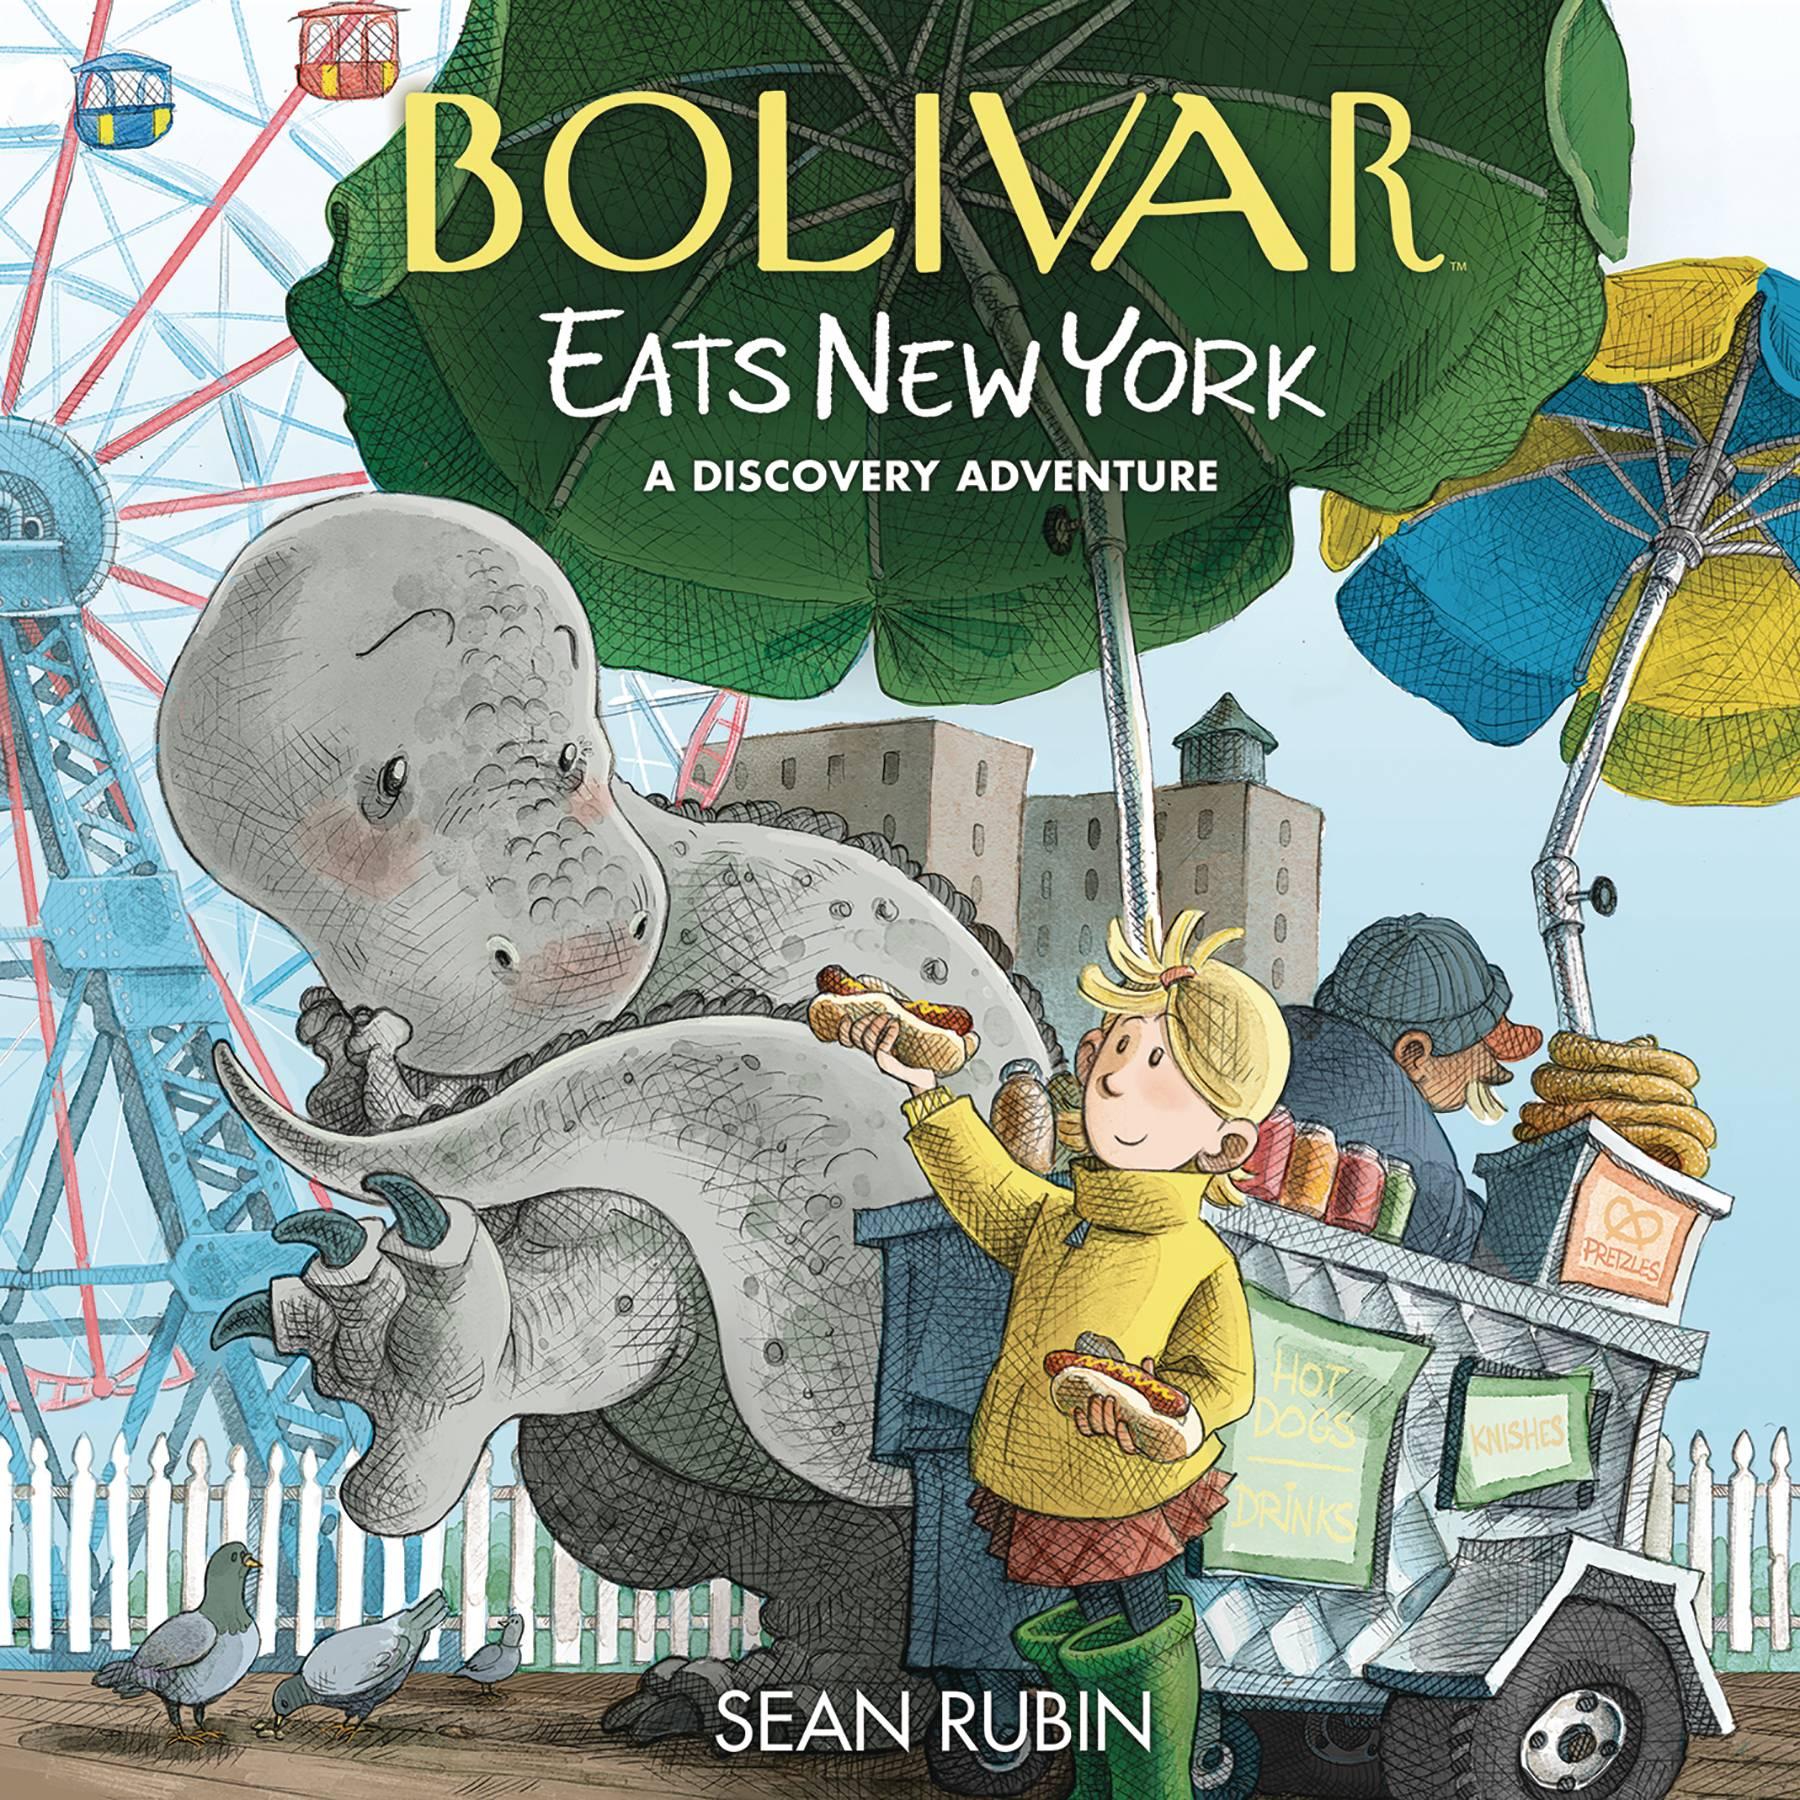 BOLIVAR EATS NEW YORK HC DISCOVERY ADVENTURE